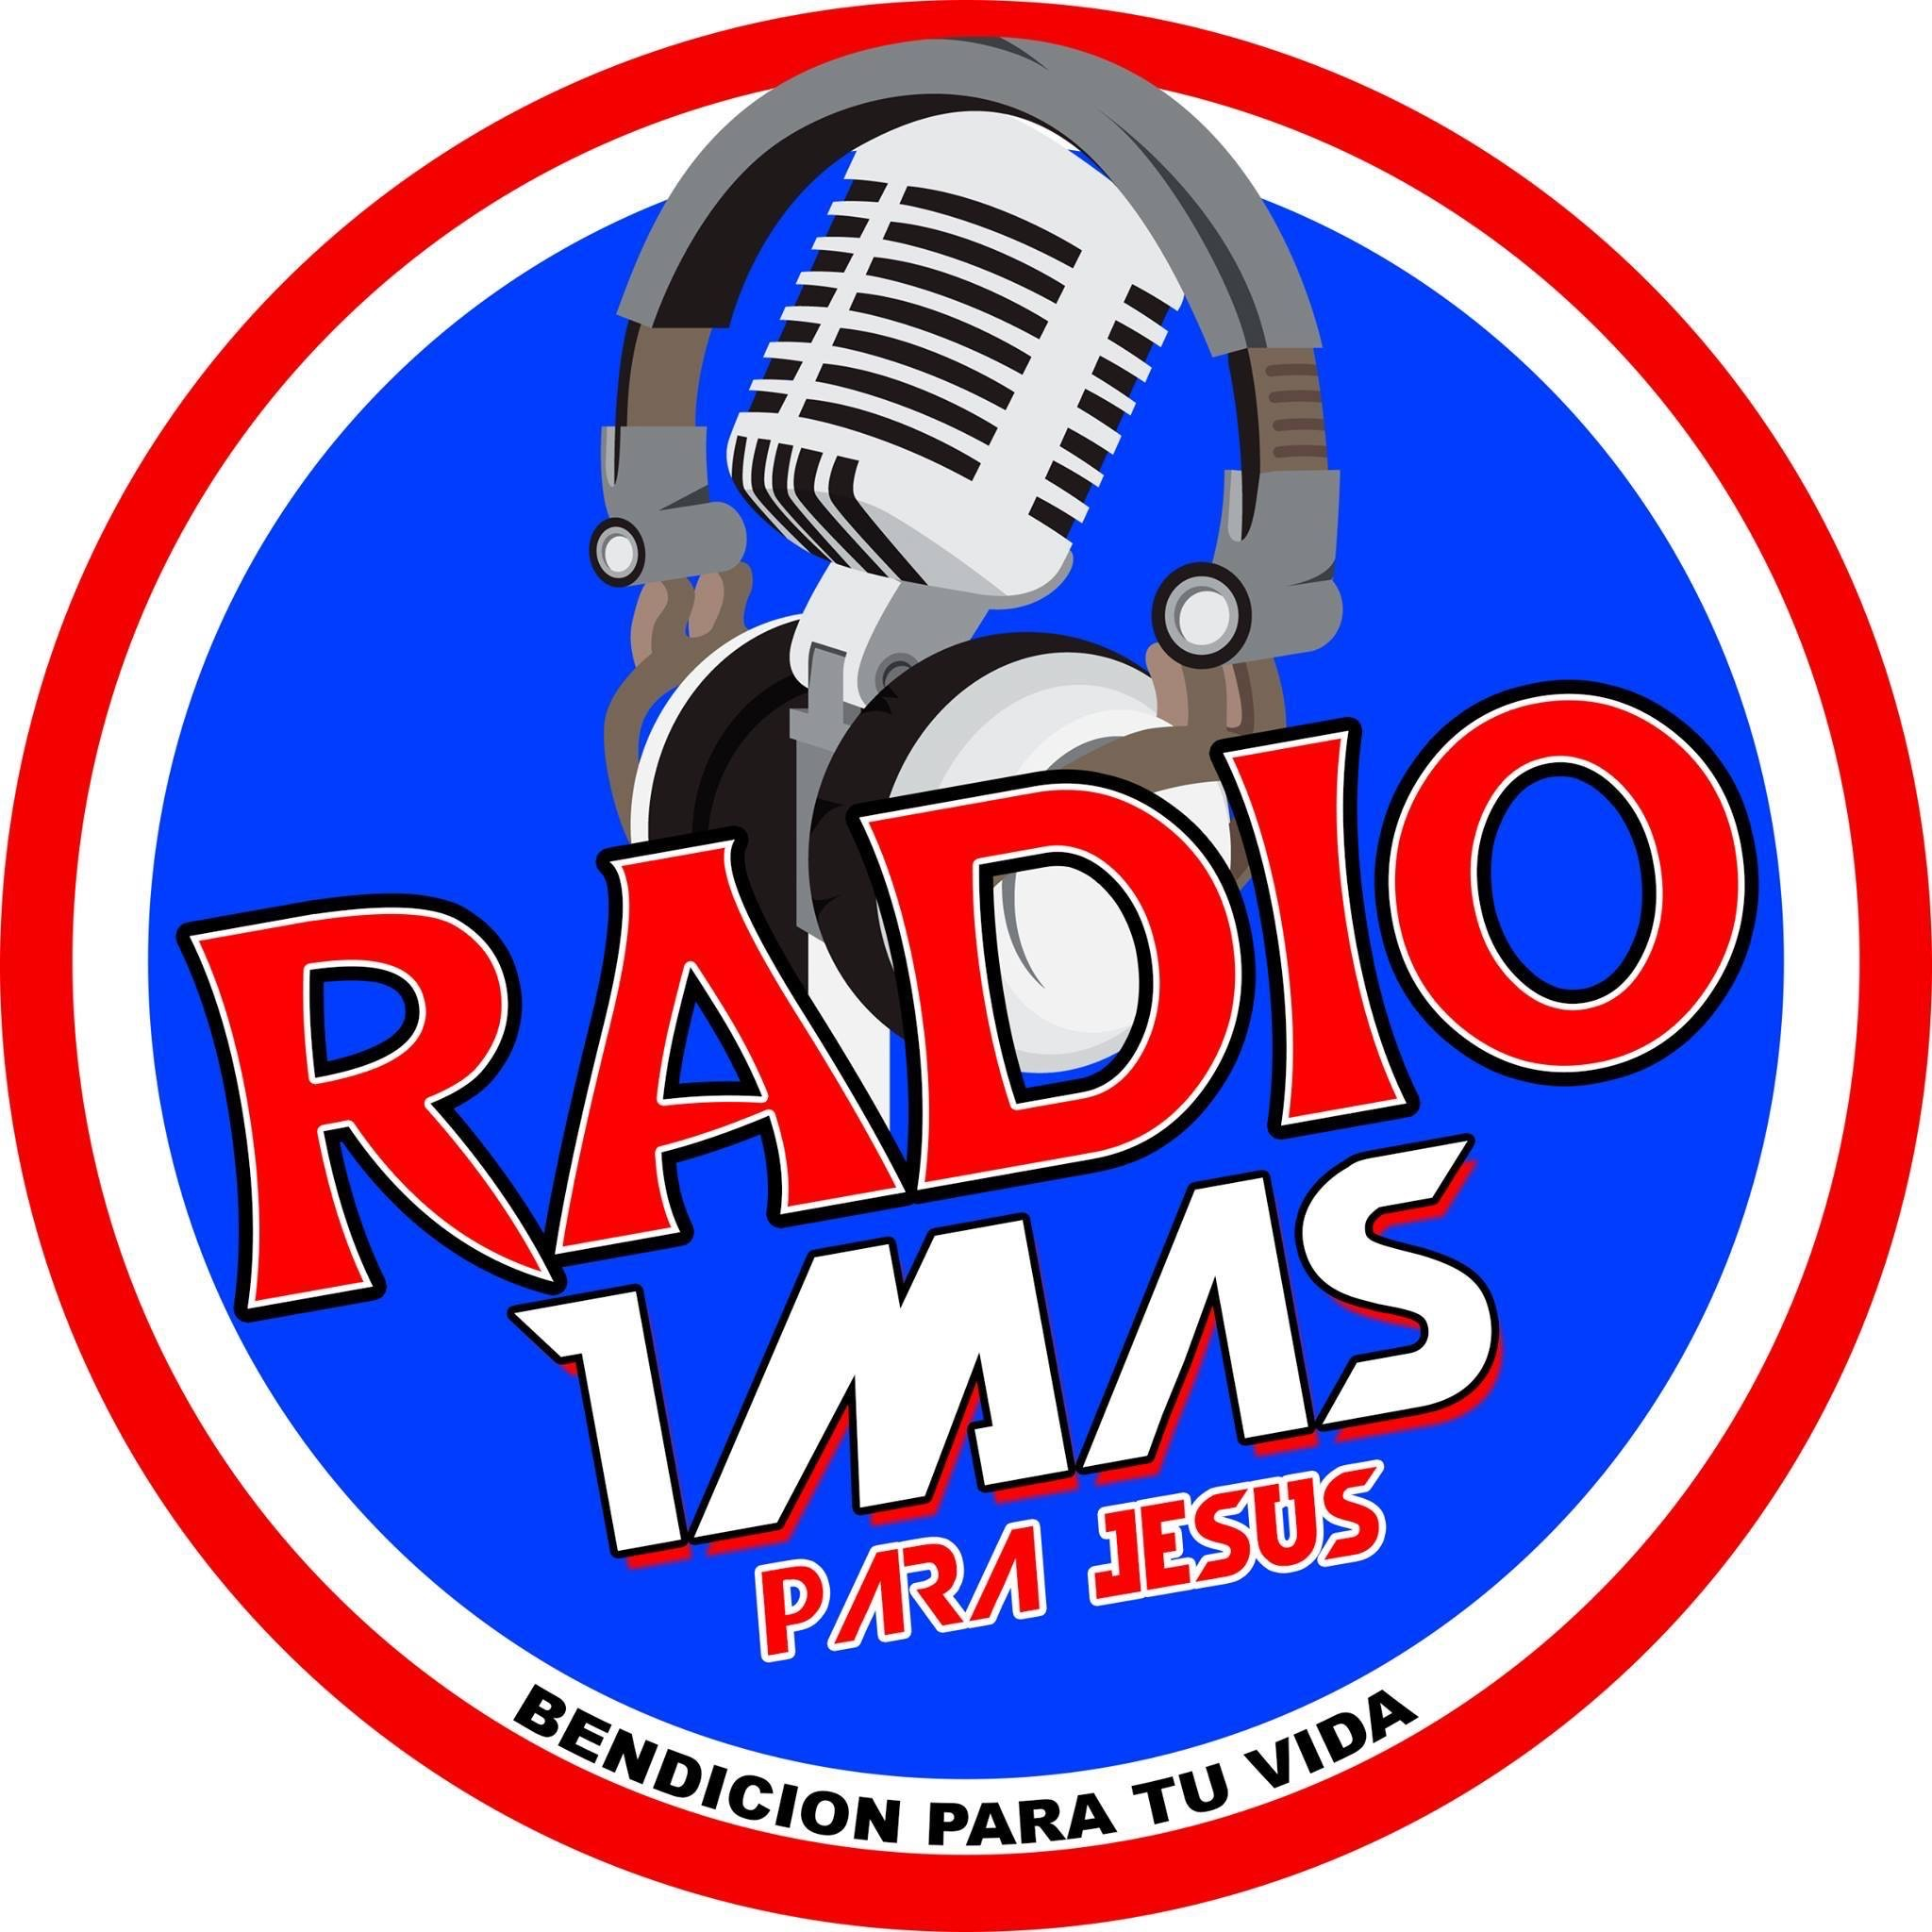 radio1masparajesusLouisiana